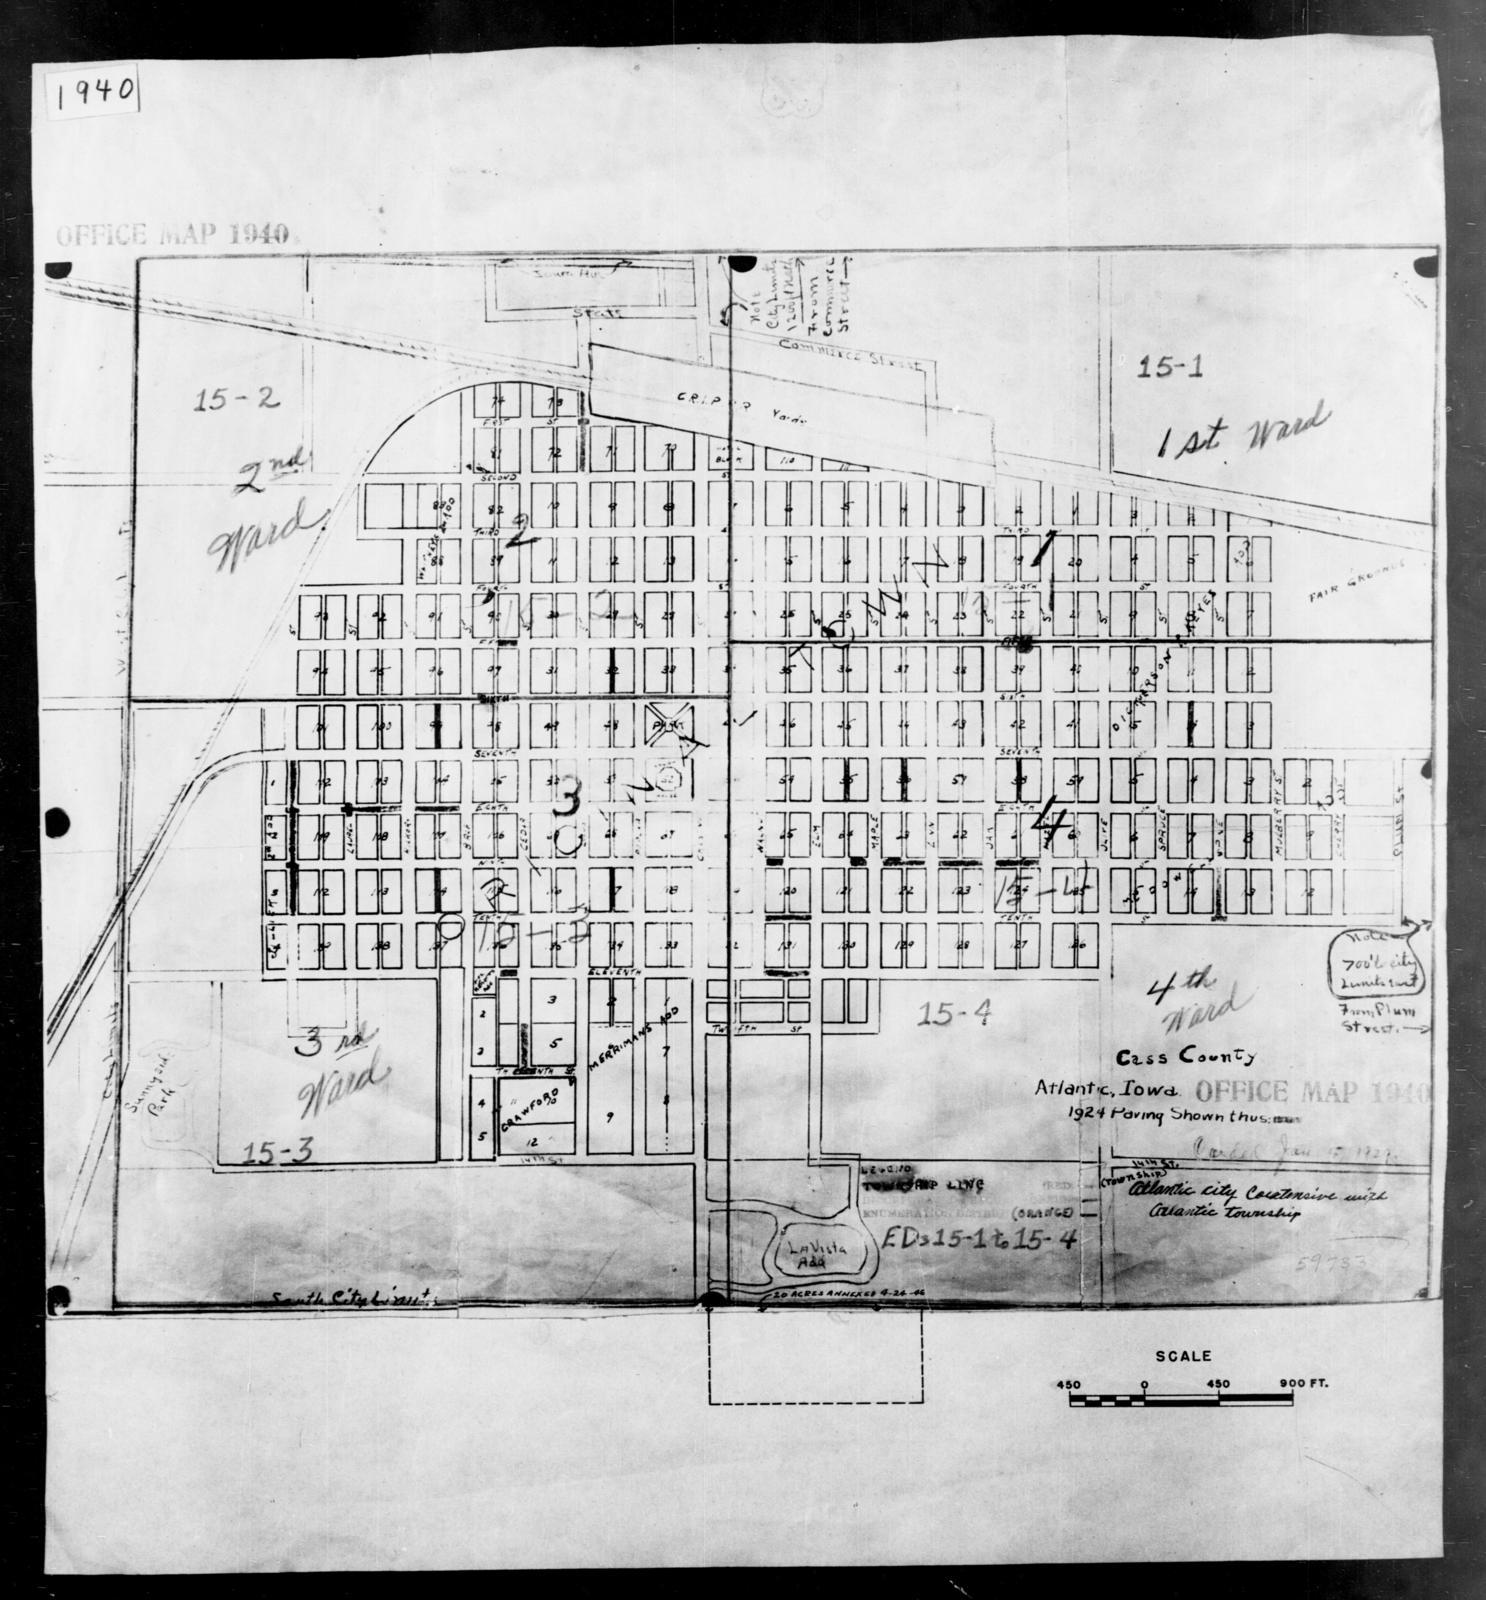 1940 Census Enumeration District Maps - Iowa - Cass County - Atlantic - ED 15-1, ED 15-2, ED 15-3A, ED 15-3B, ED 15-4A, ED 15-4B